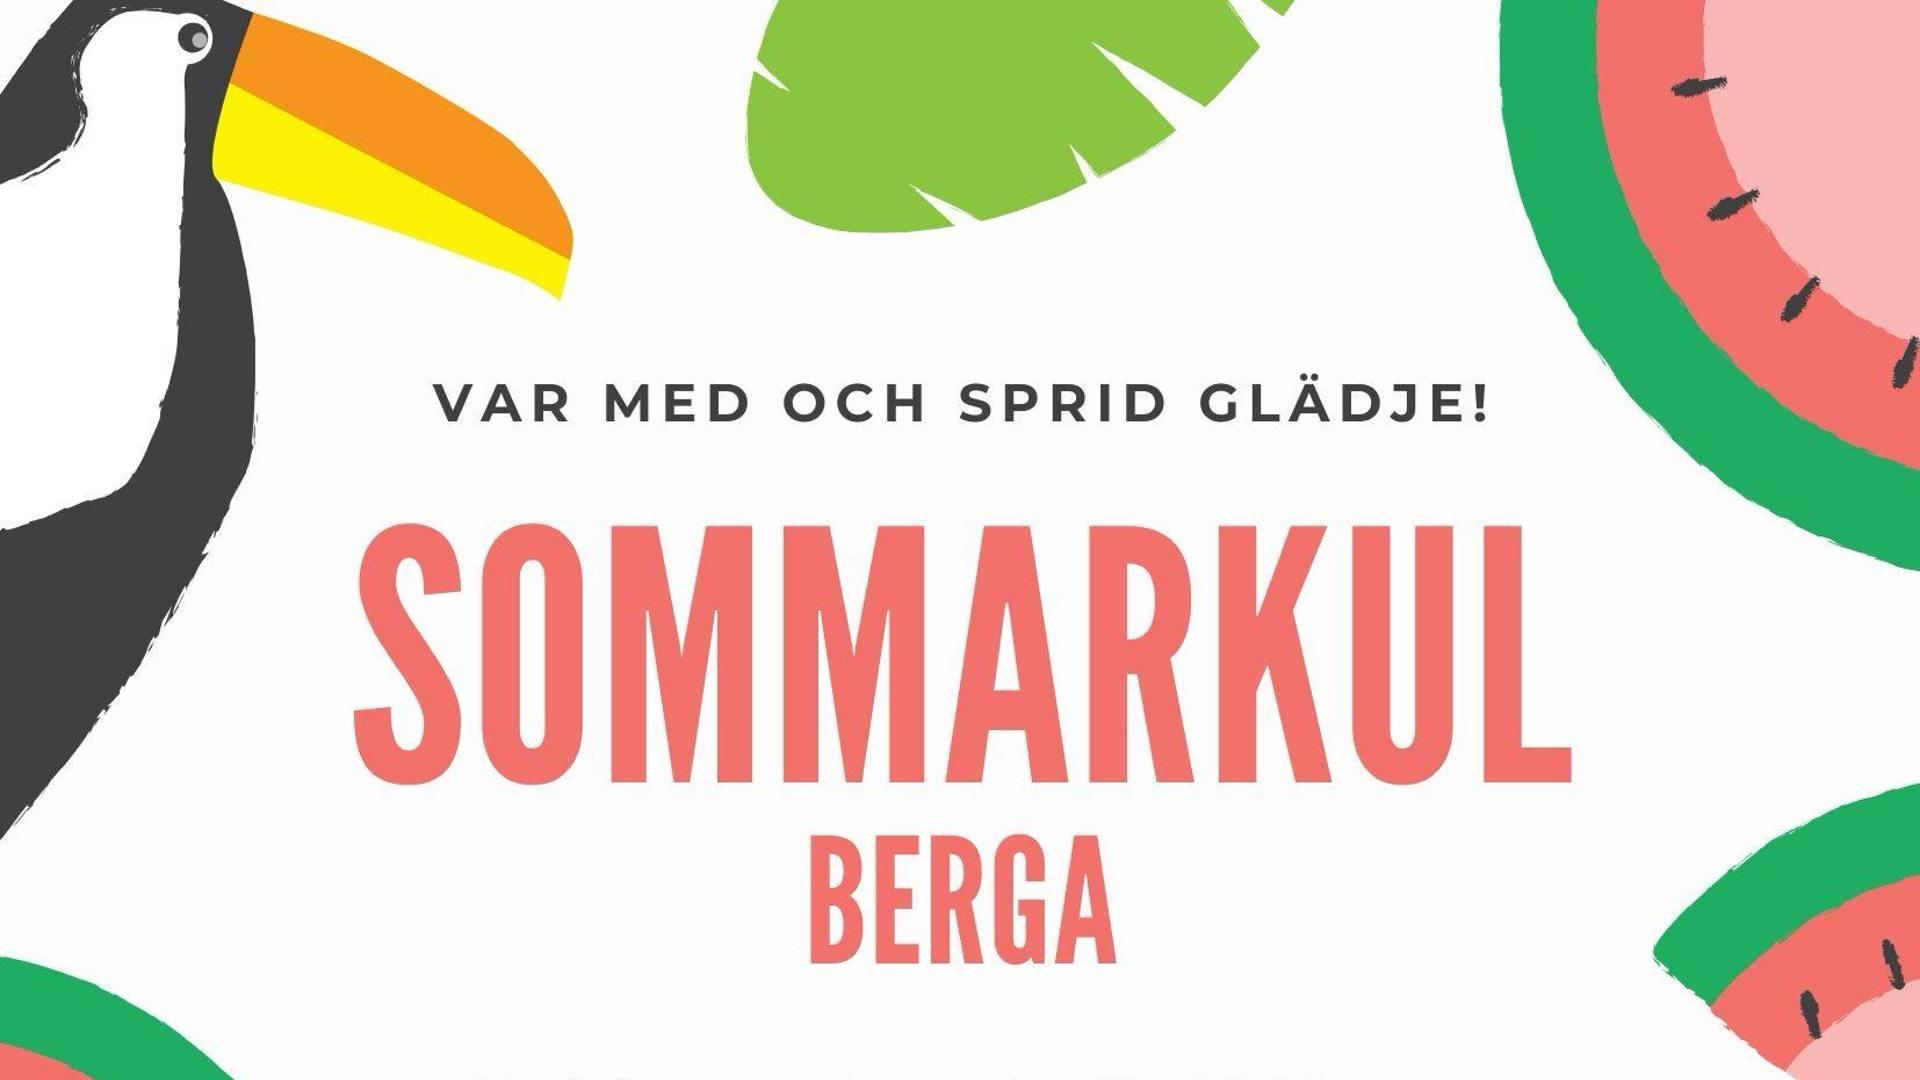 Sommarkul